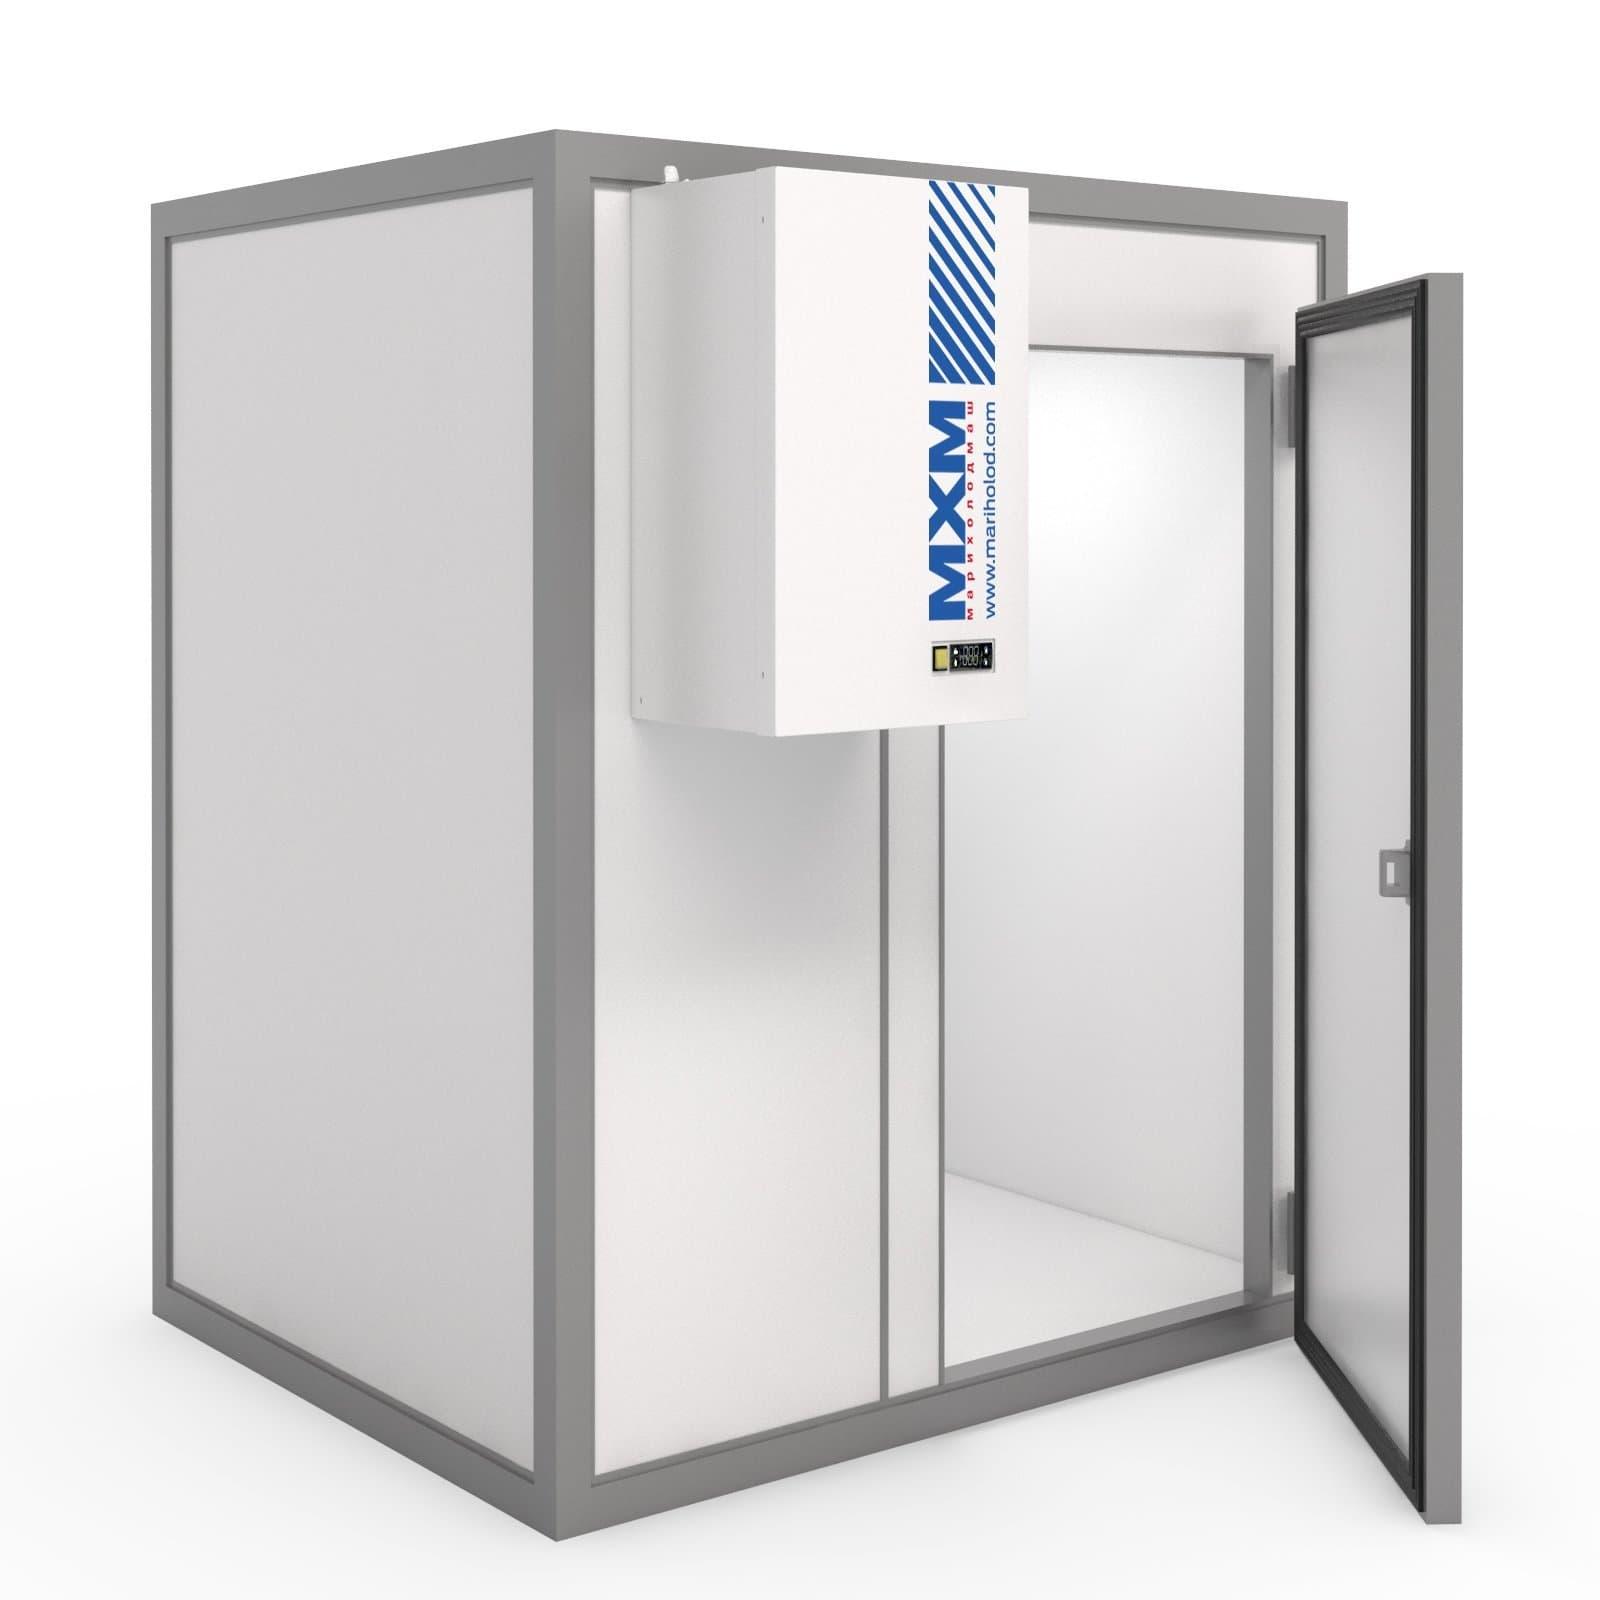 Камера холодильная МХМ КХН-56,30 2560×10360×2460